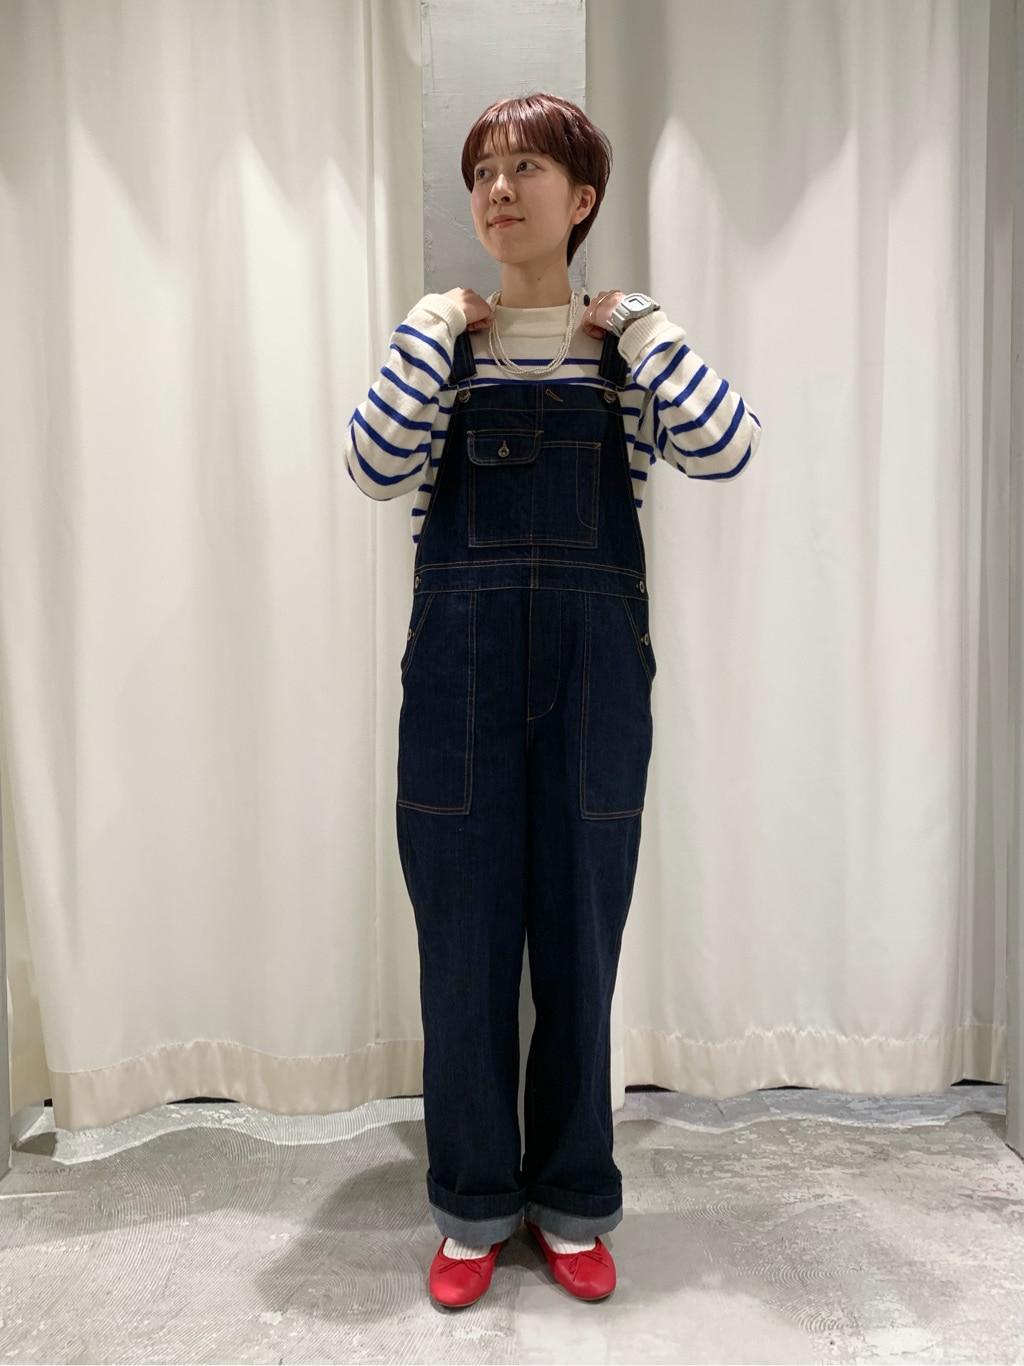 - CHILD WOMAN CHILD WOMAN , PAR ICI ルミネ横浜 身長:158cm 2020.12.22